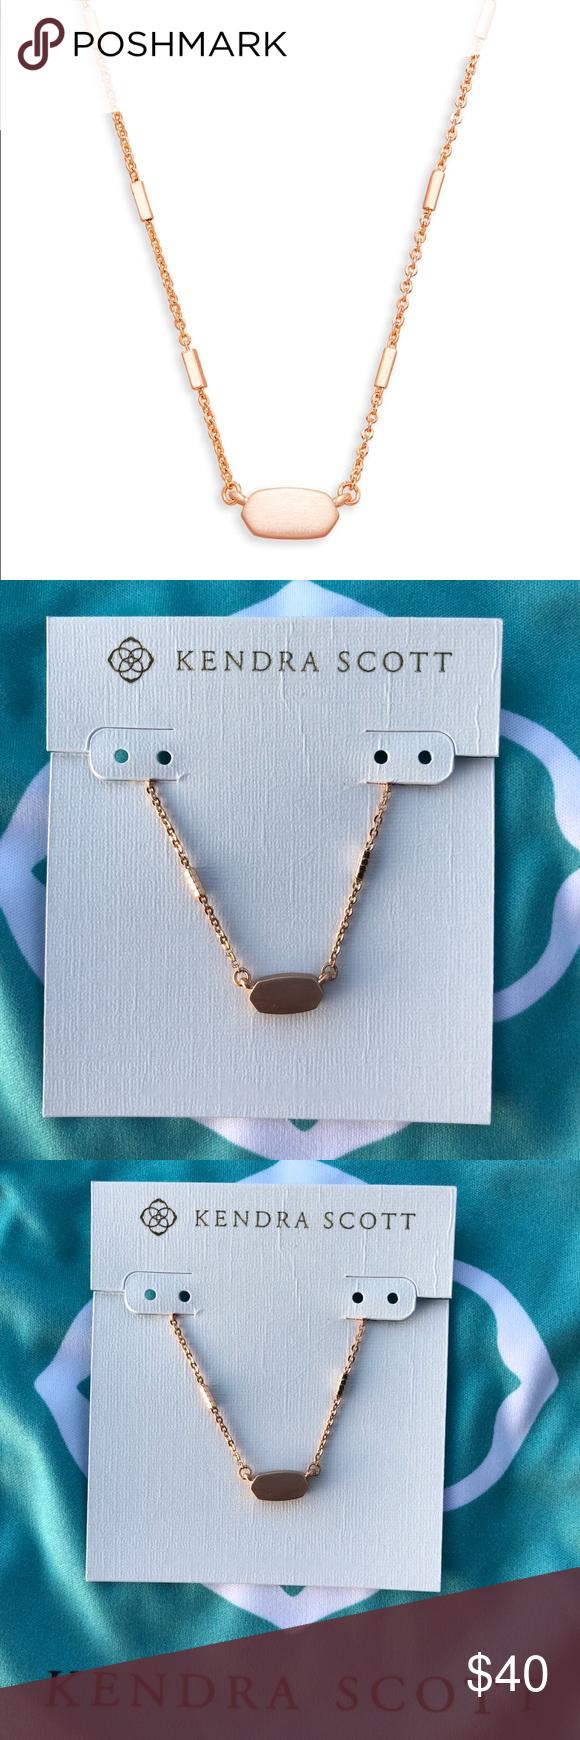 Kendra scott fern rose gold necklace nwt in my posh picks